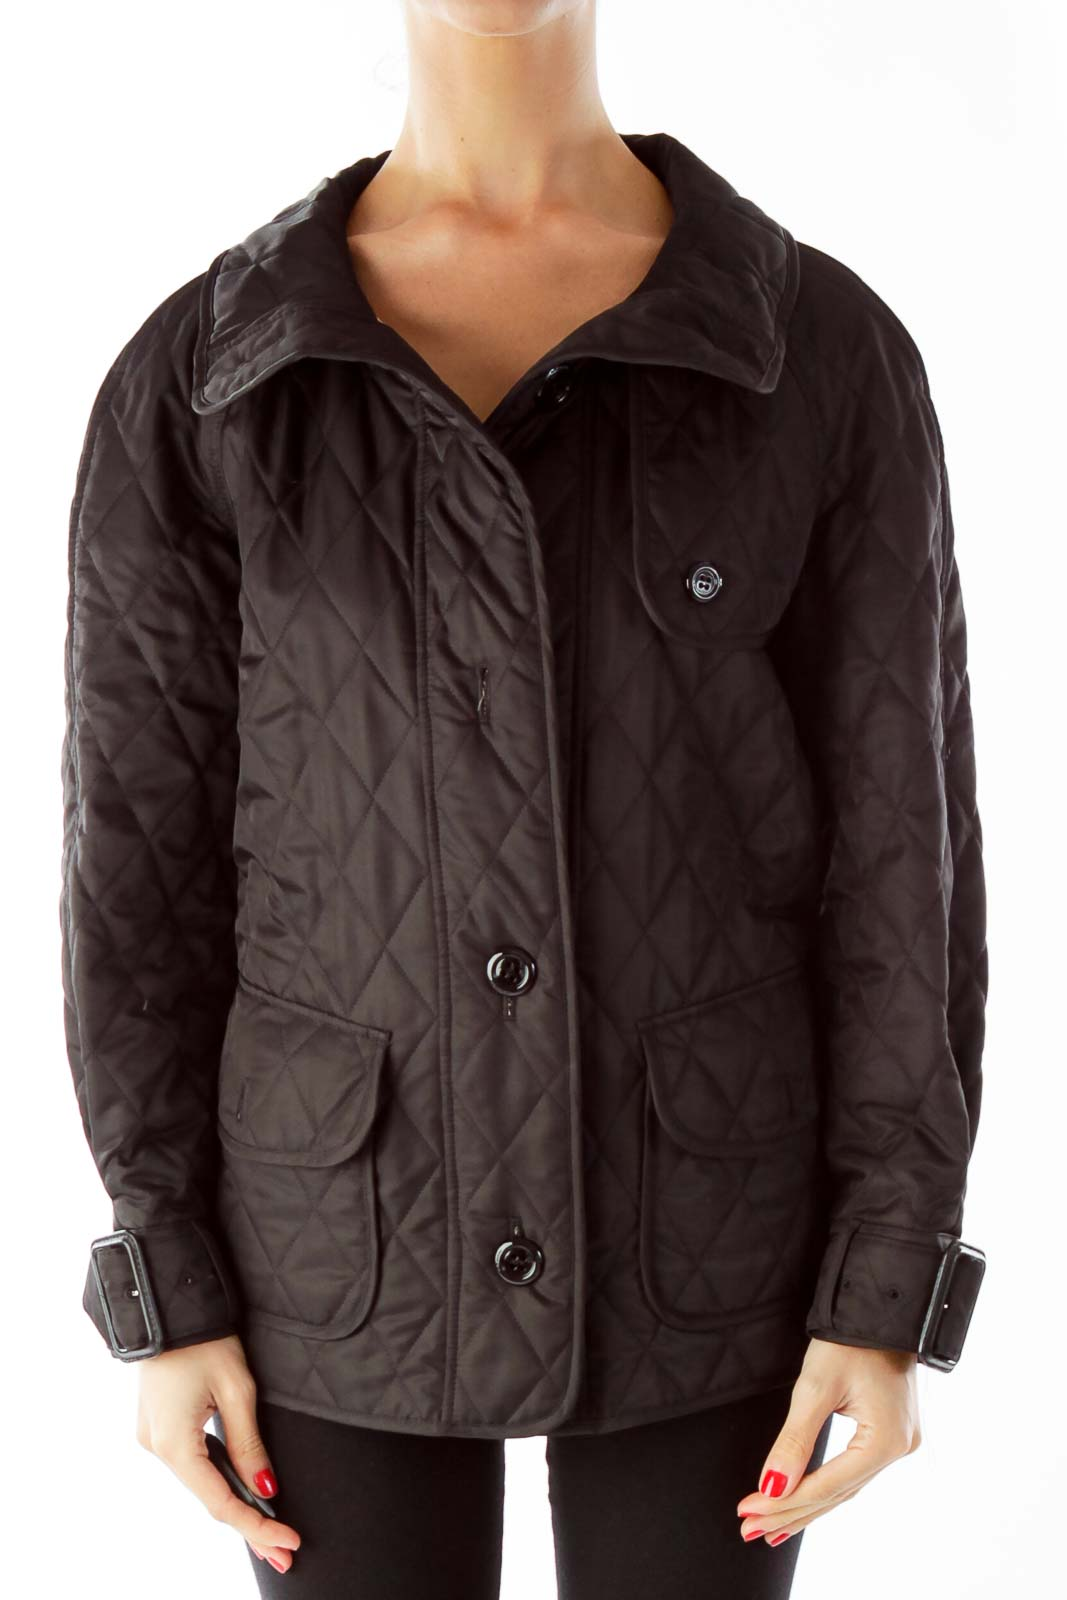 Black Burberry Cool Weather Jacket